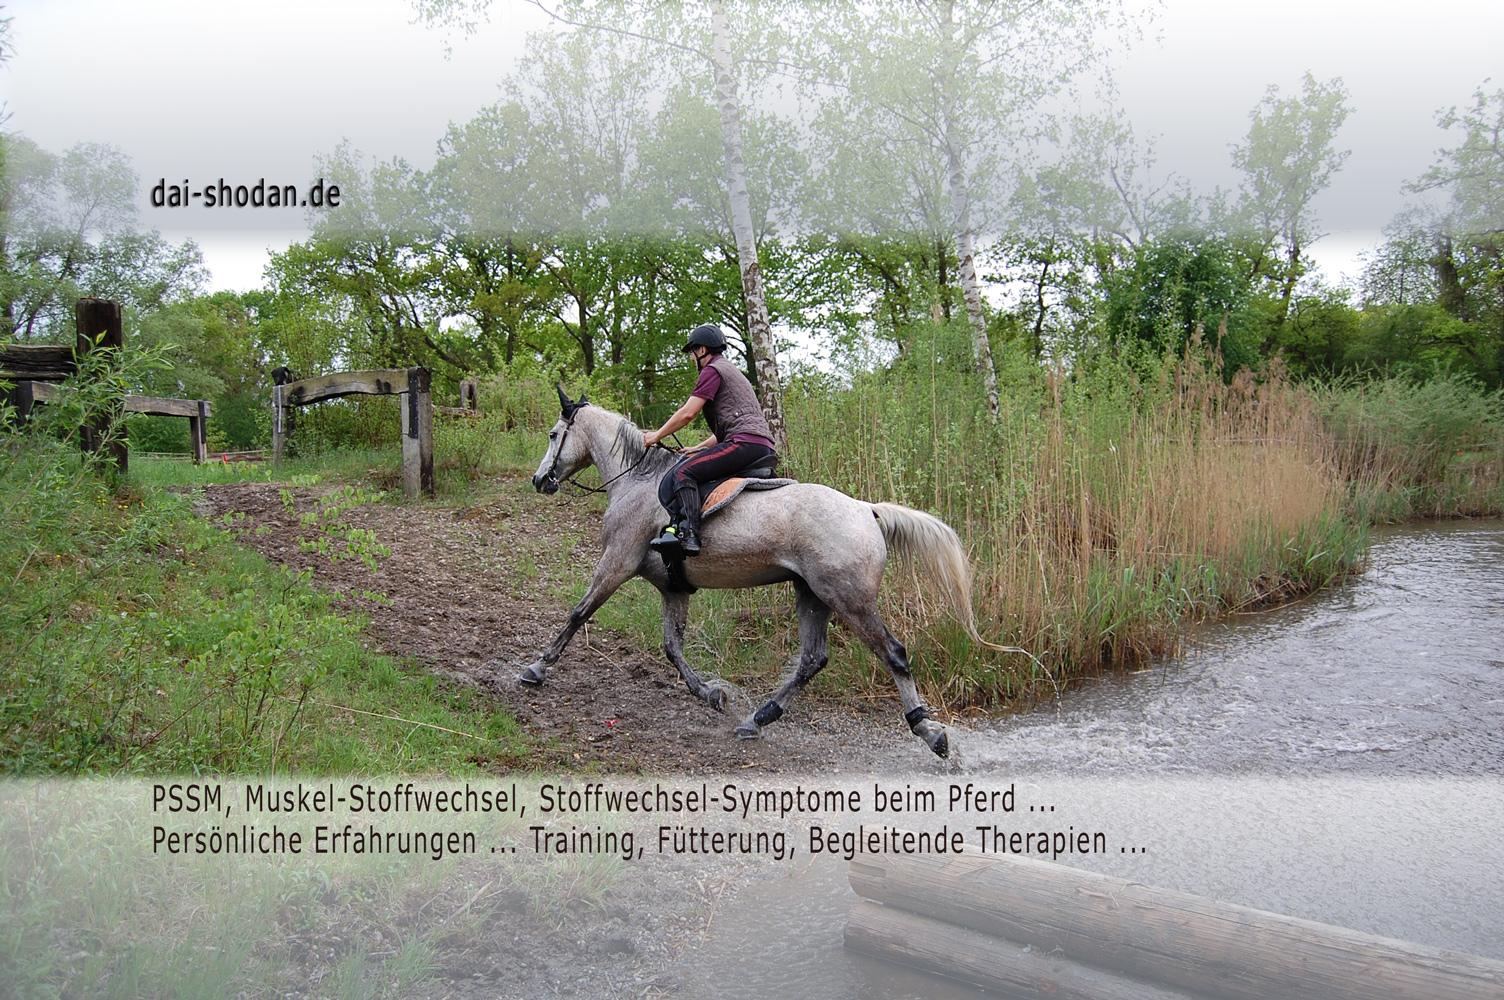 Exertional Rhabdomyolysis in Horses